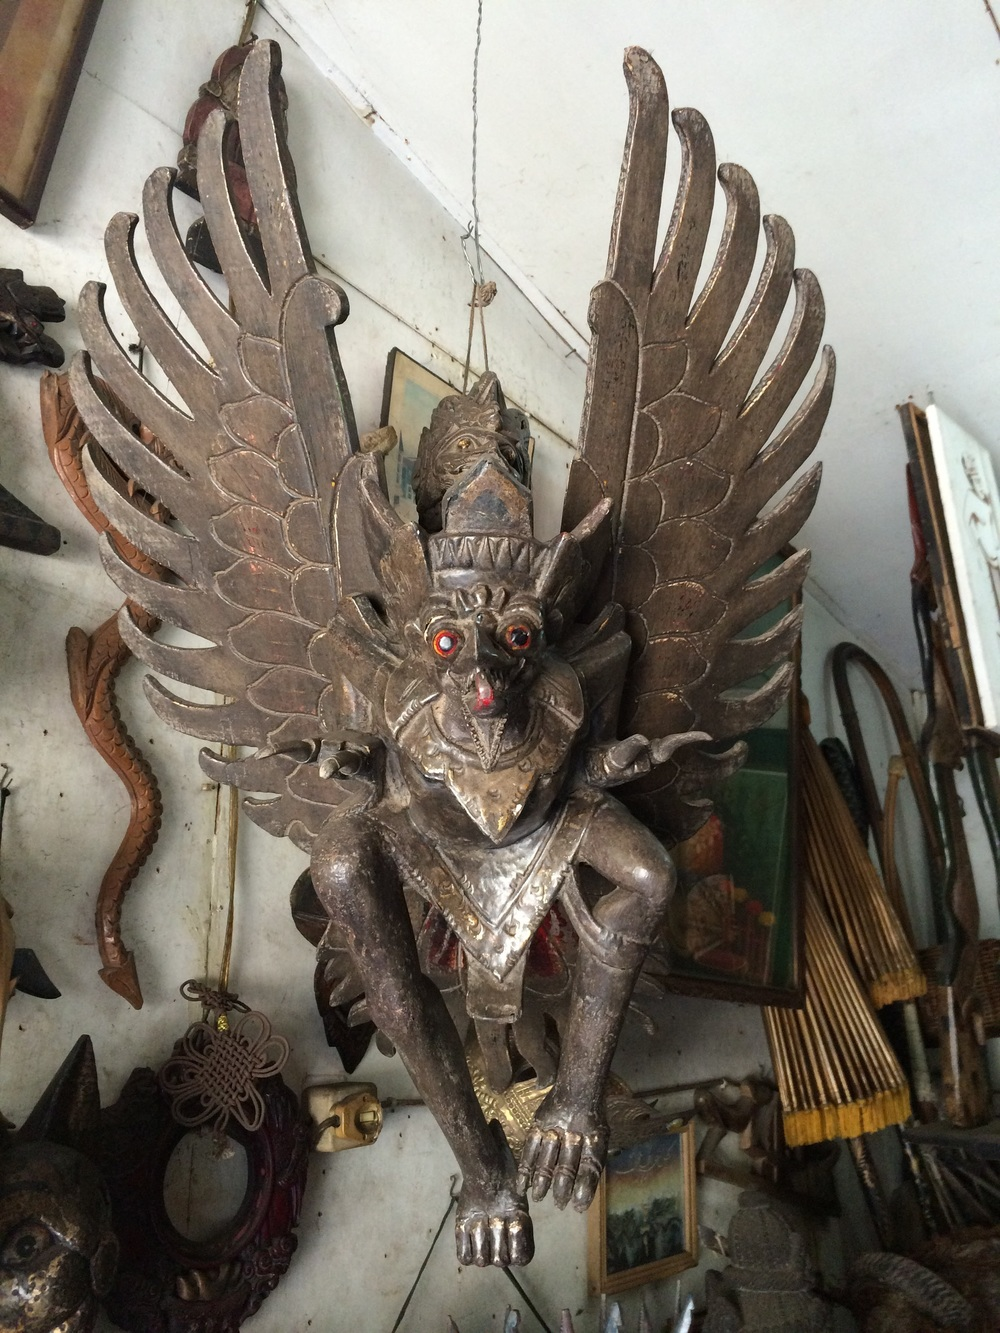 Garuda in all his glory. #notcreepy